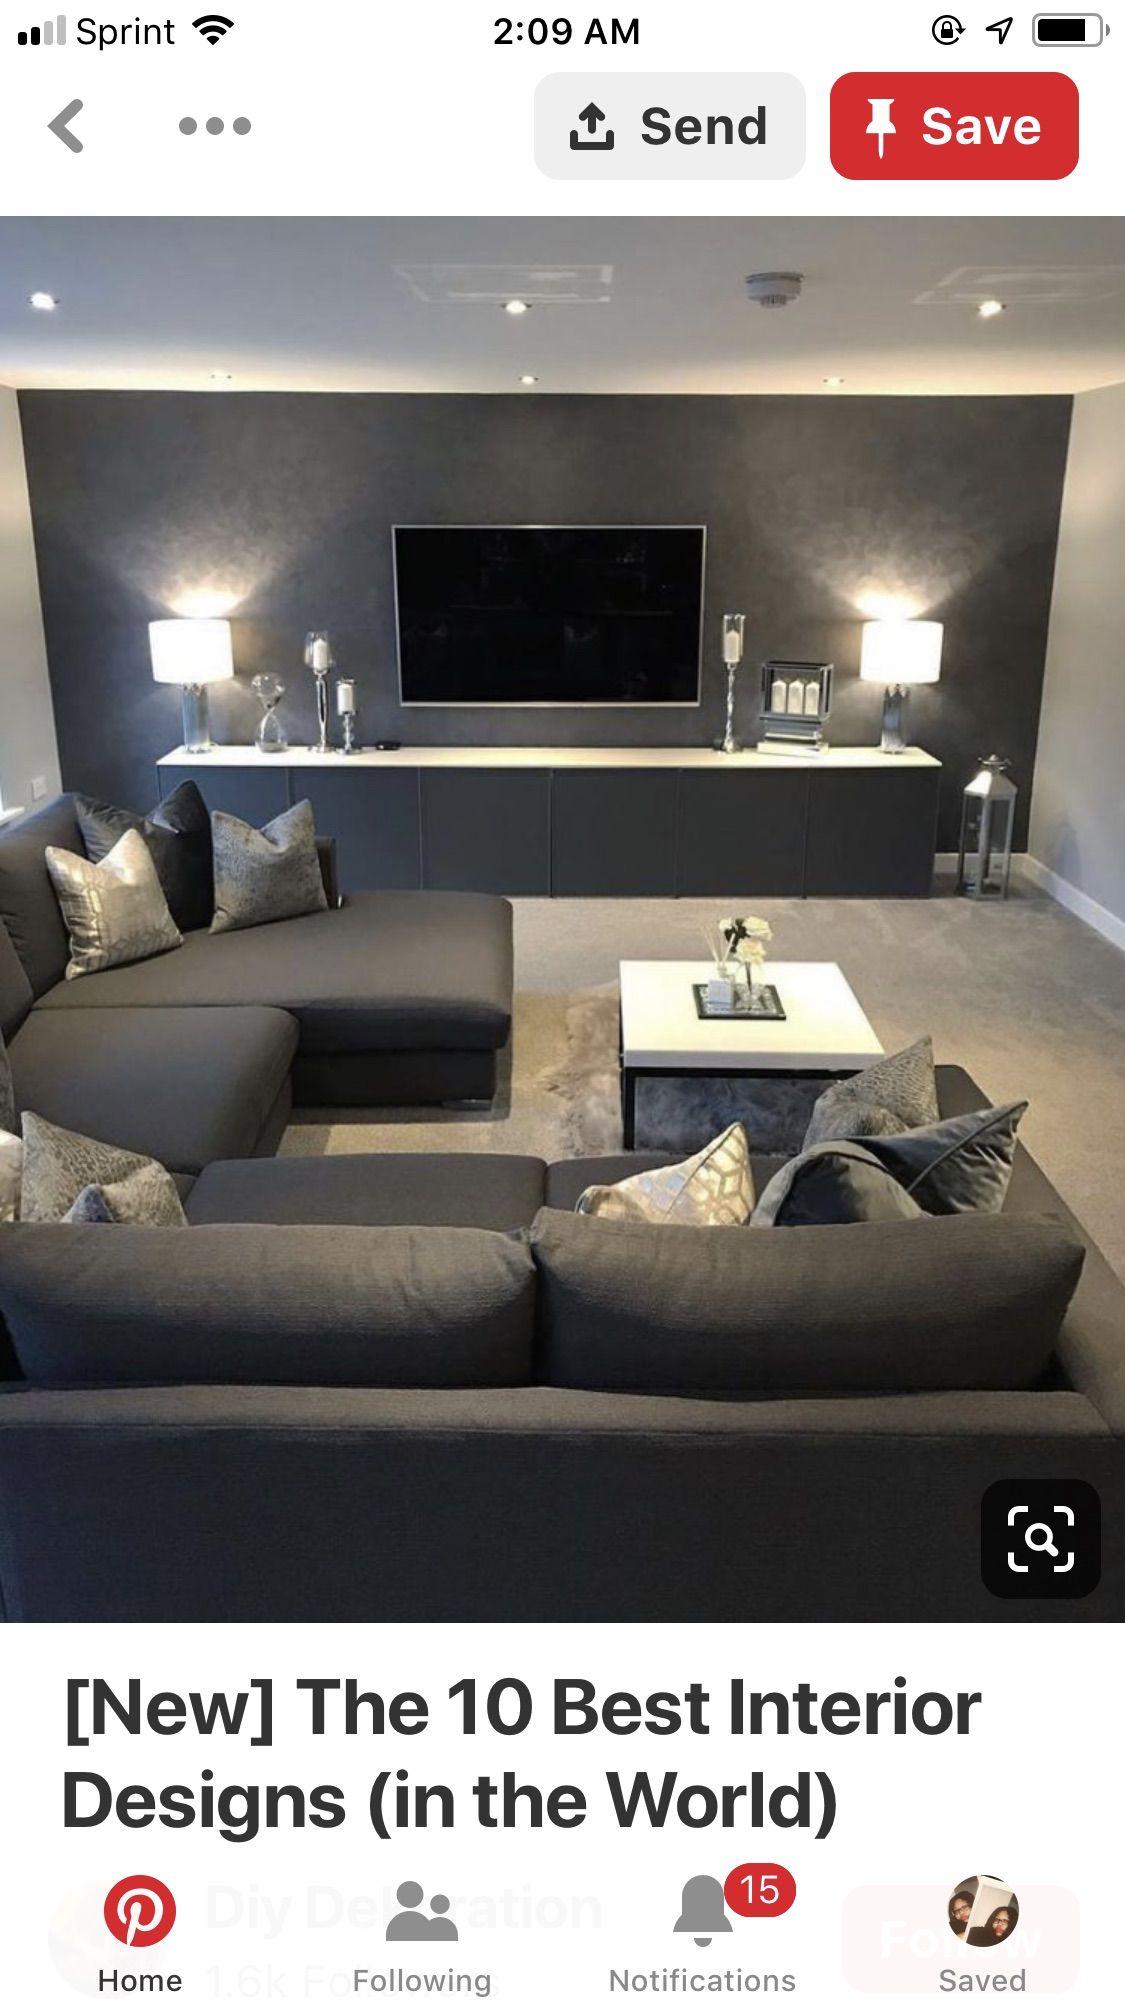 Pin by Maggali Laurent on Home Decor & DIYs  Home cinema room